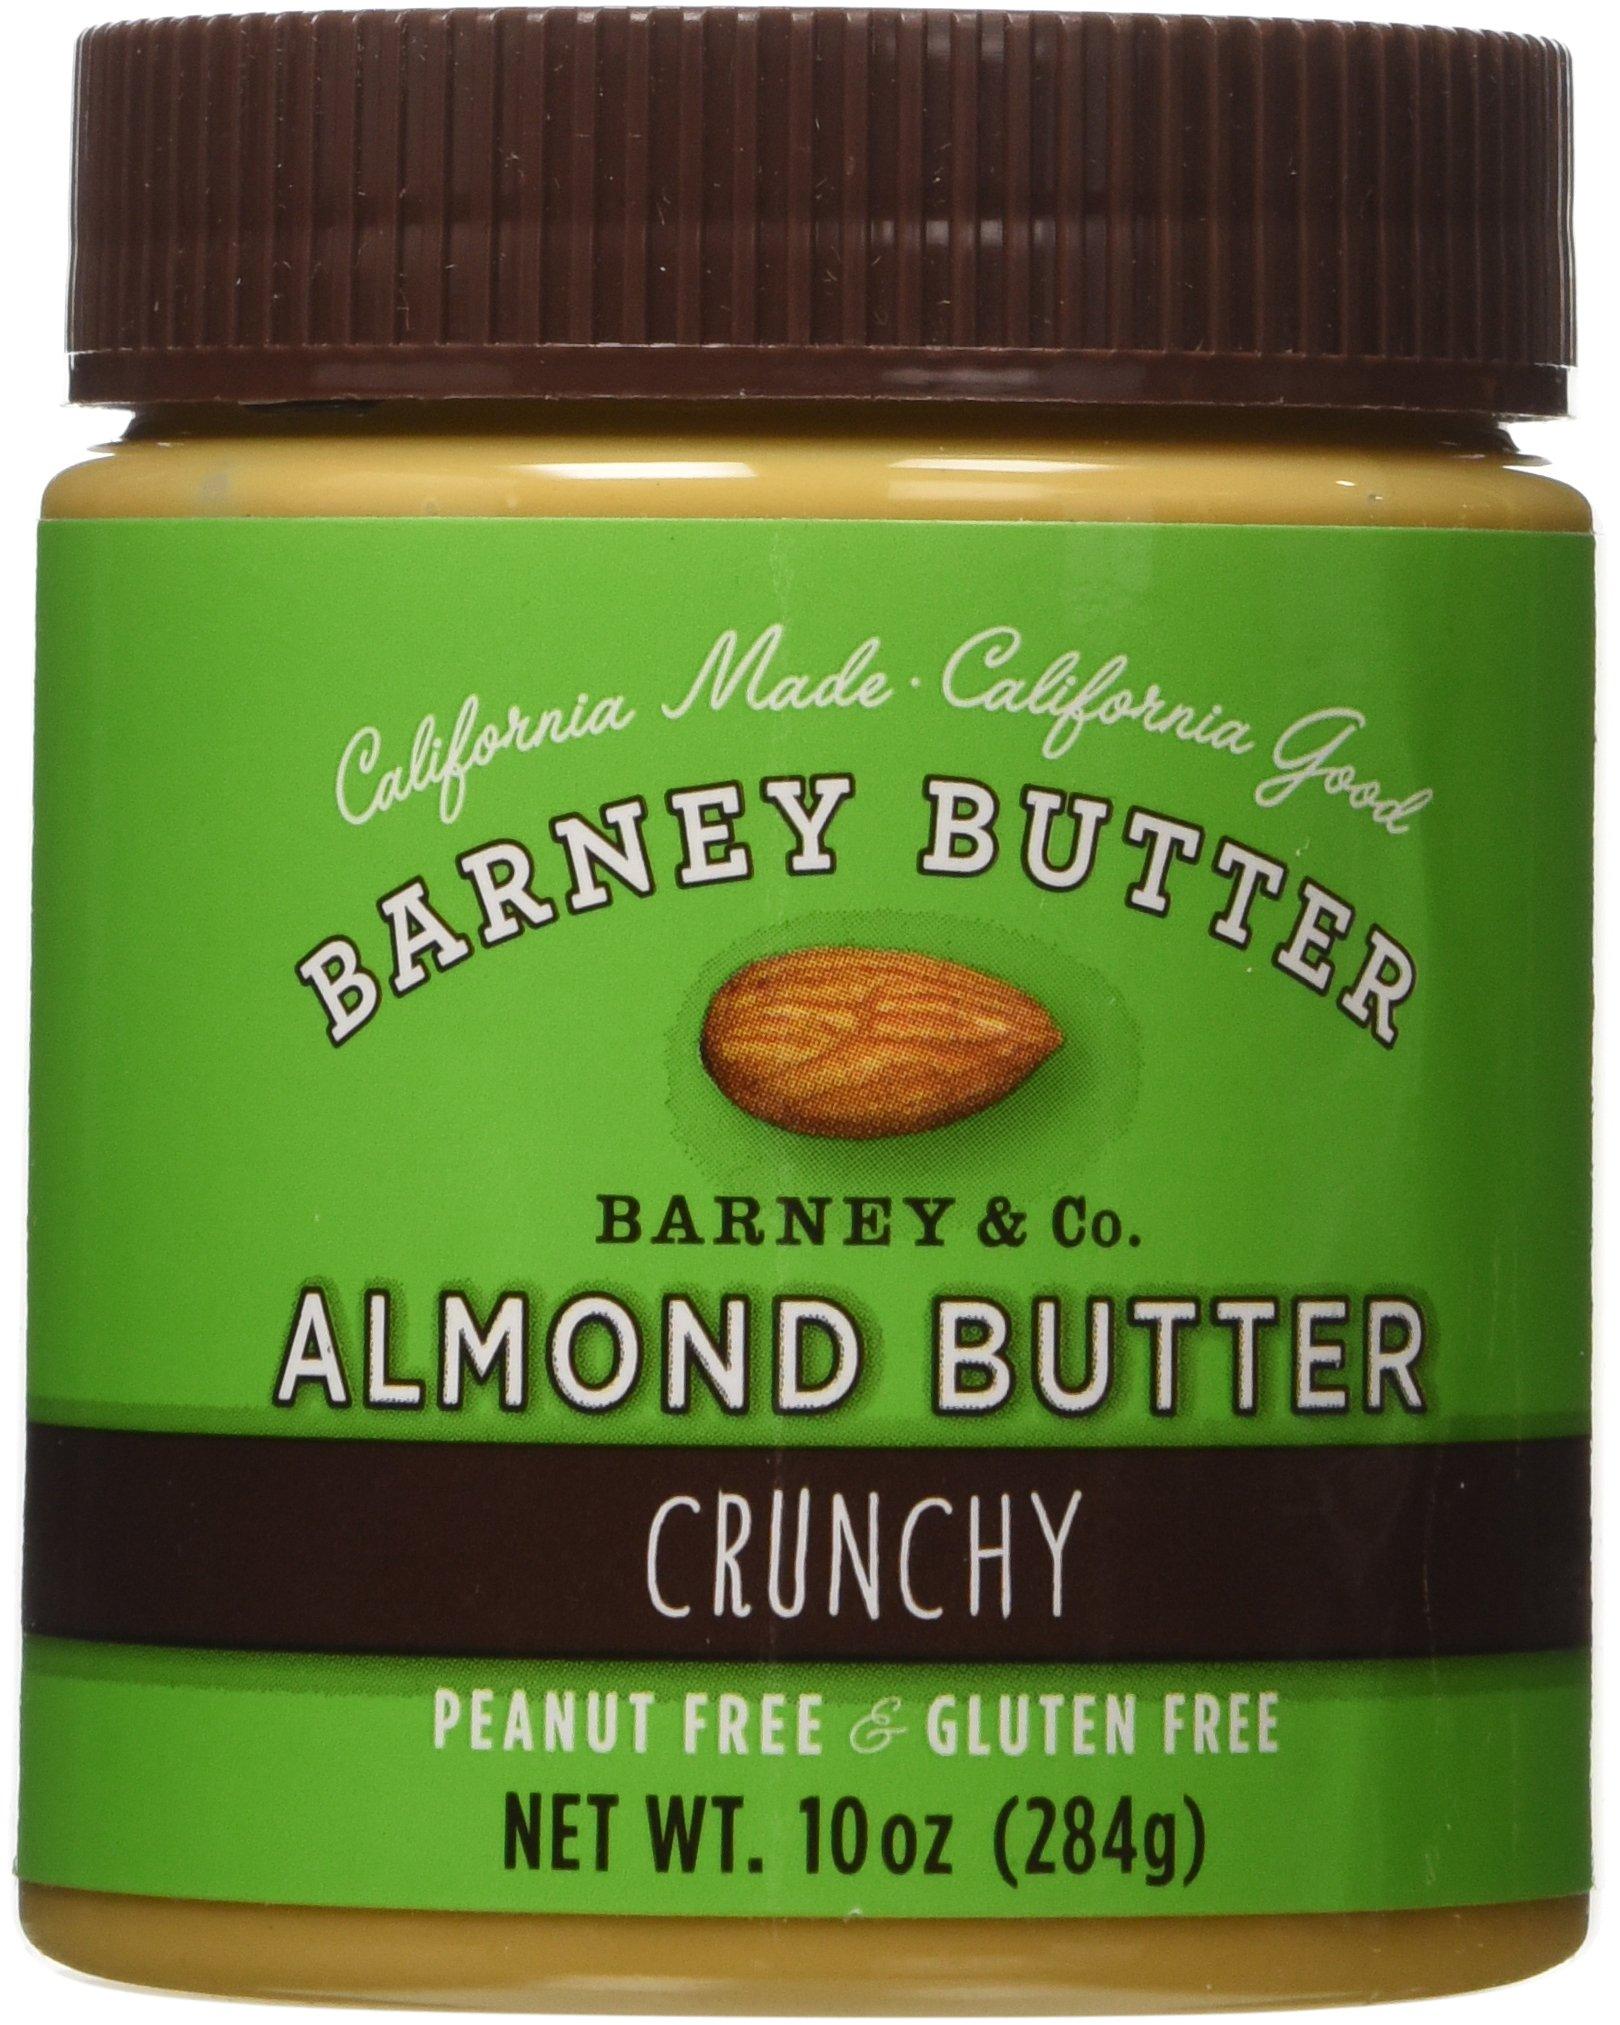 Barney Butter Crunchy Almond Butter - 10 oz by Barney Butter